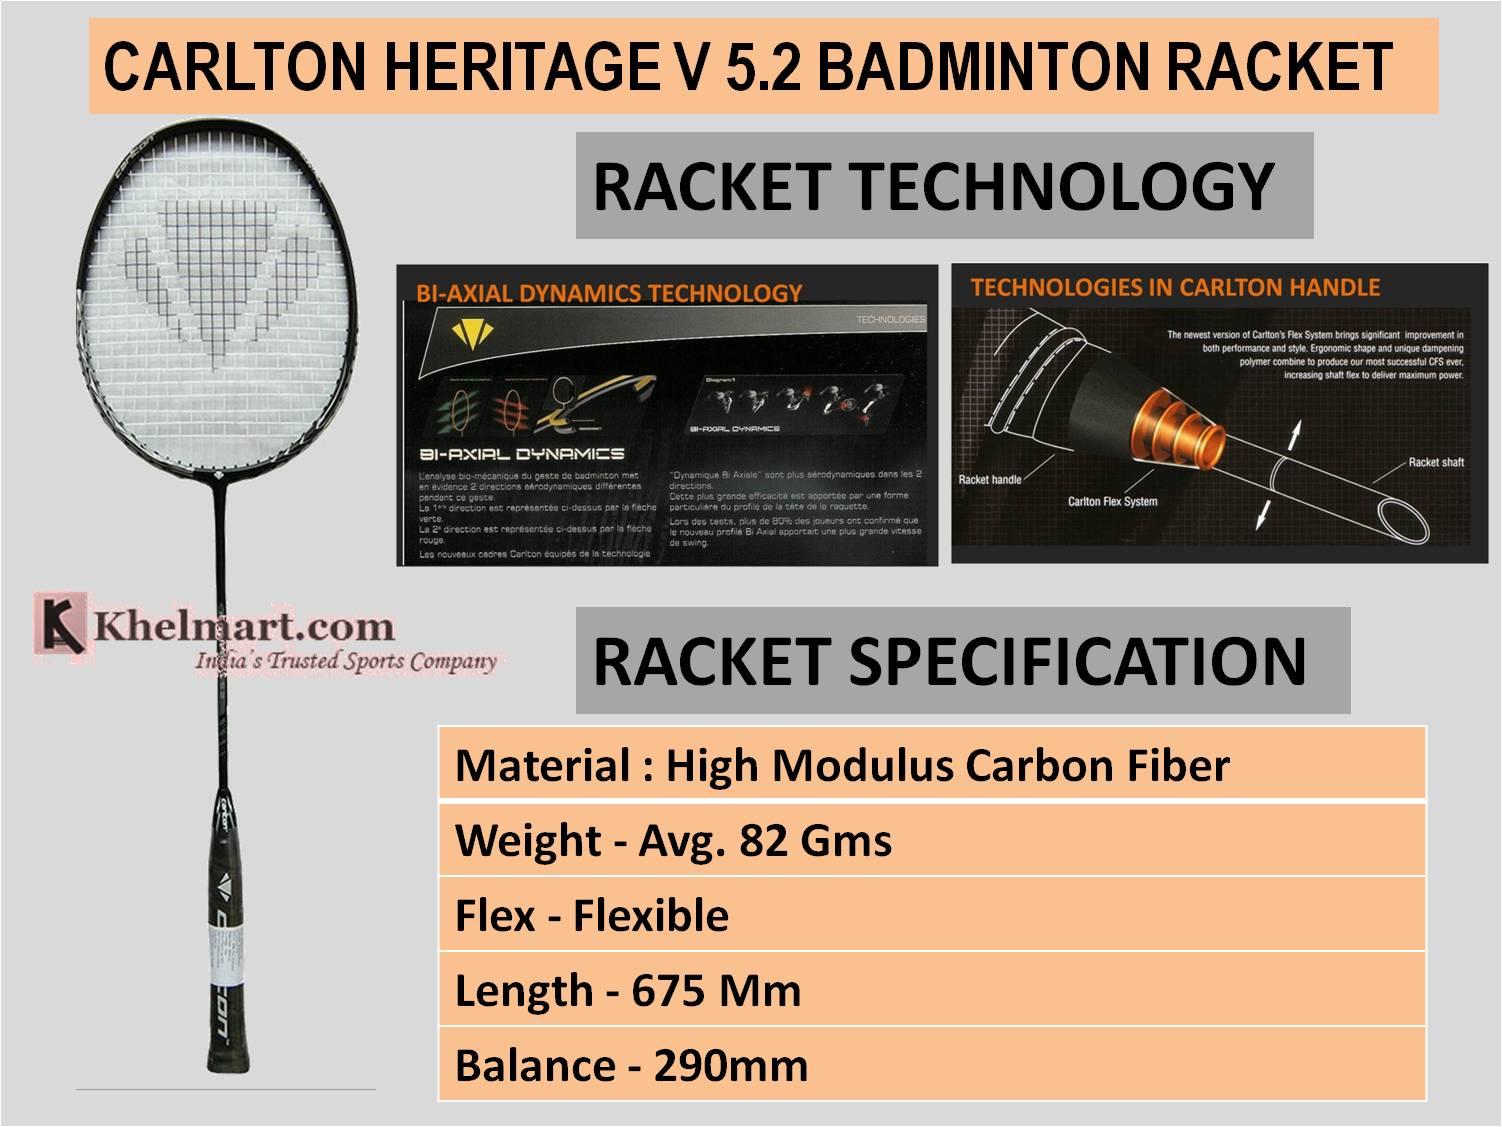 CARLTON_HERITAGE_BADMINTON_RACKET